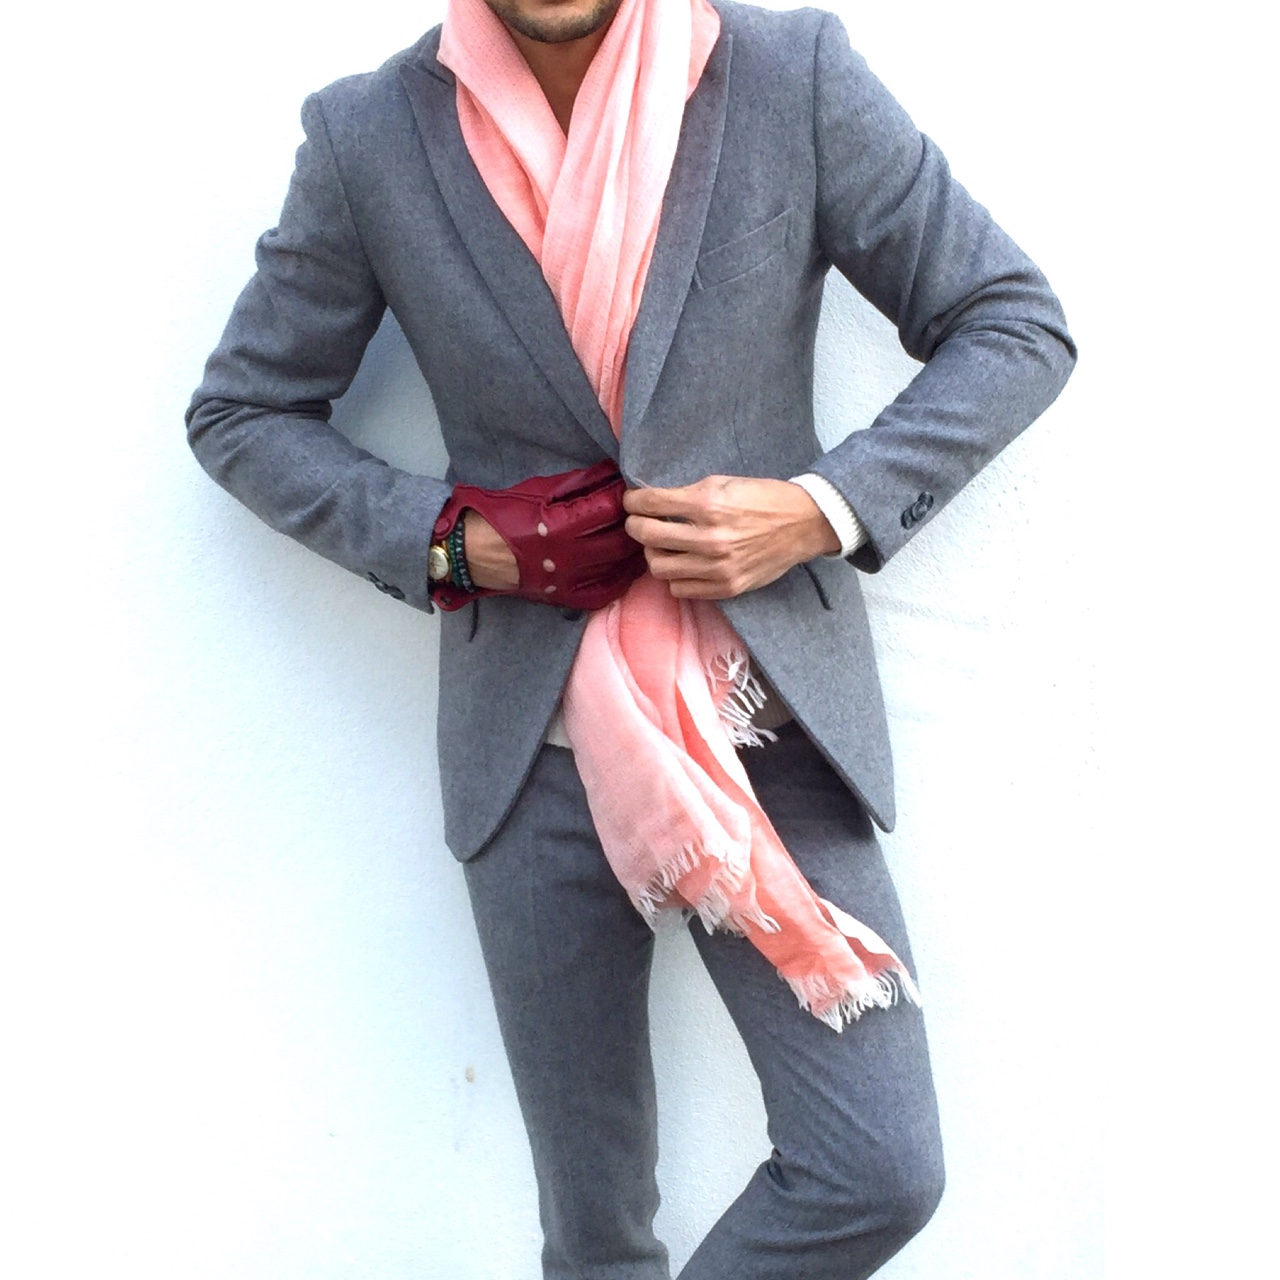 louisnicolasdarbon :     Grey x Pink    Full details of my outfit on the Blog 👉www.louisnicolasdarbon.freshnet.com